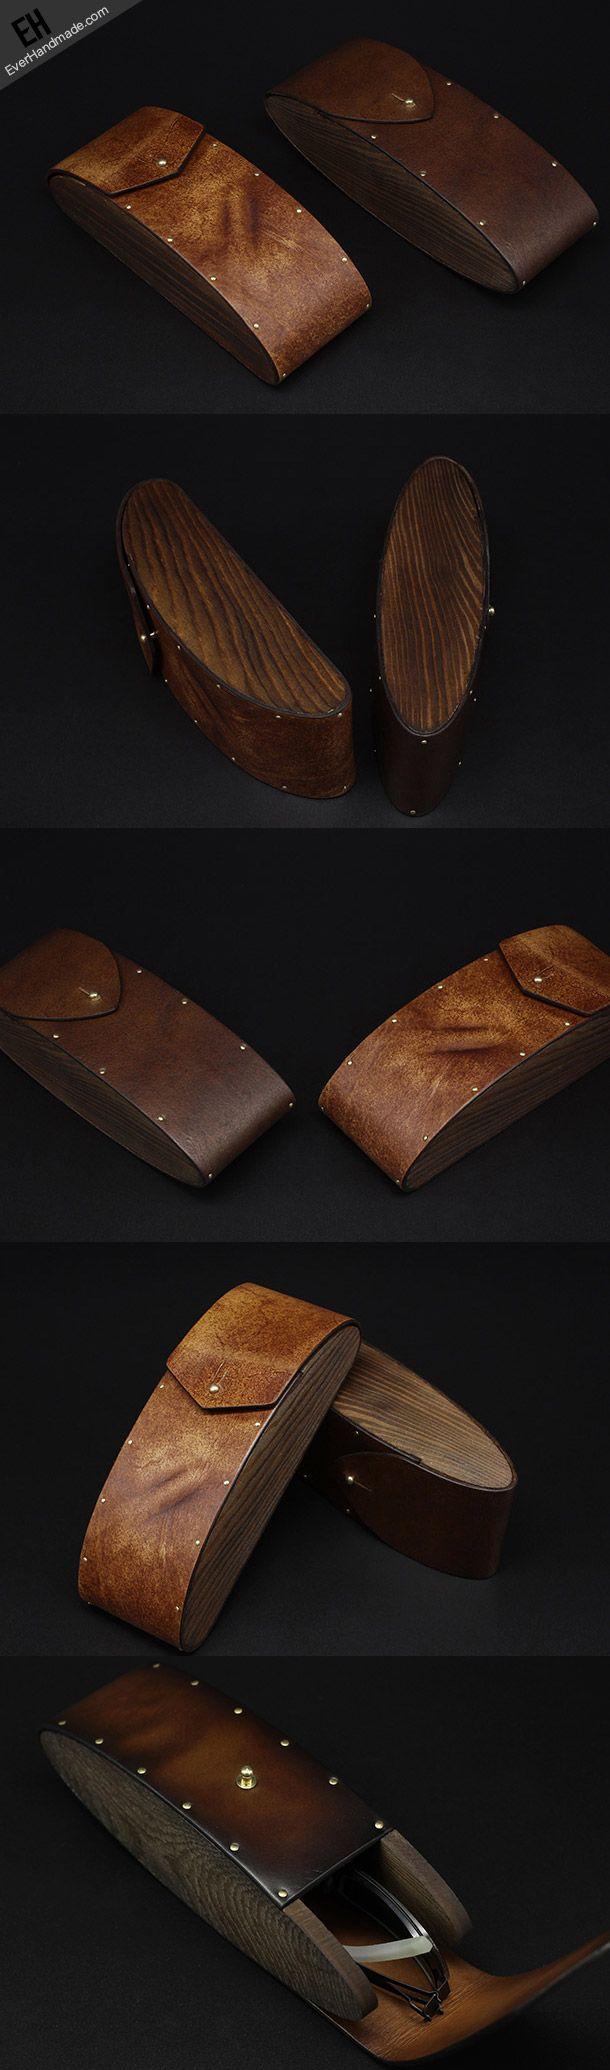 Handmade Vintage leather glasses case wood glasses